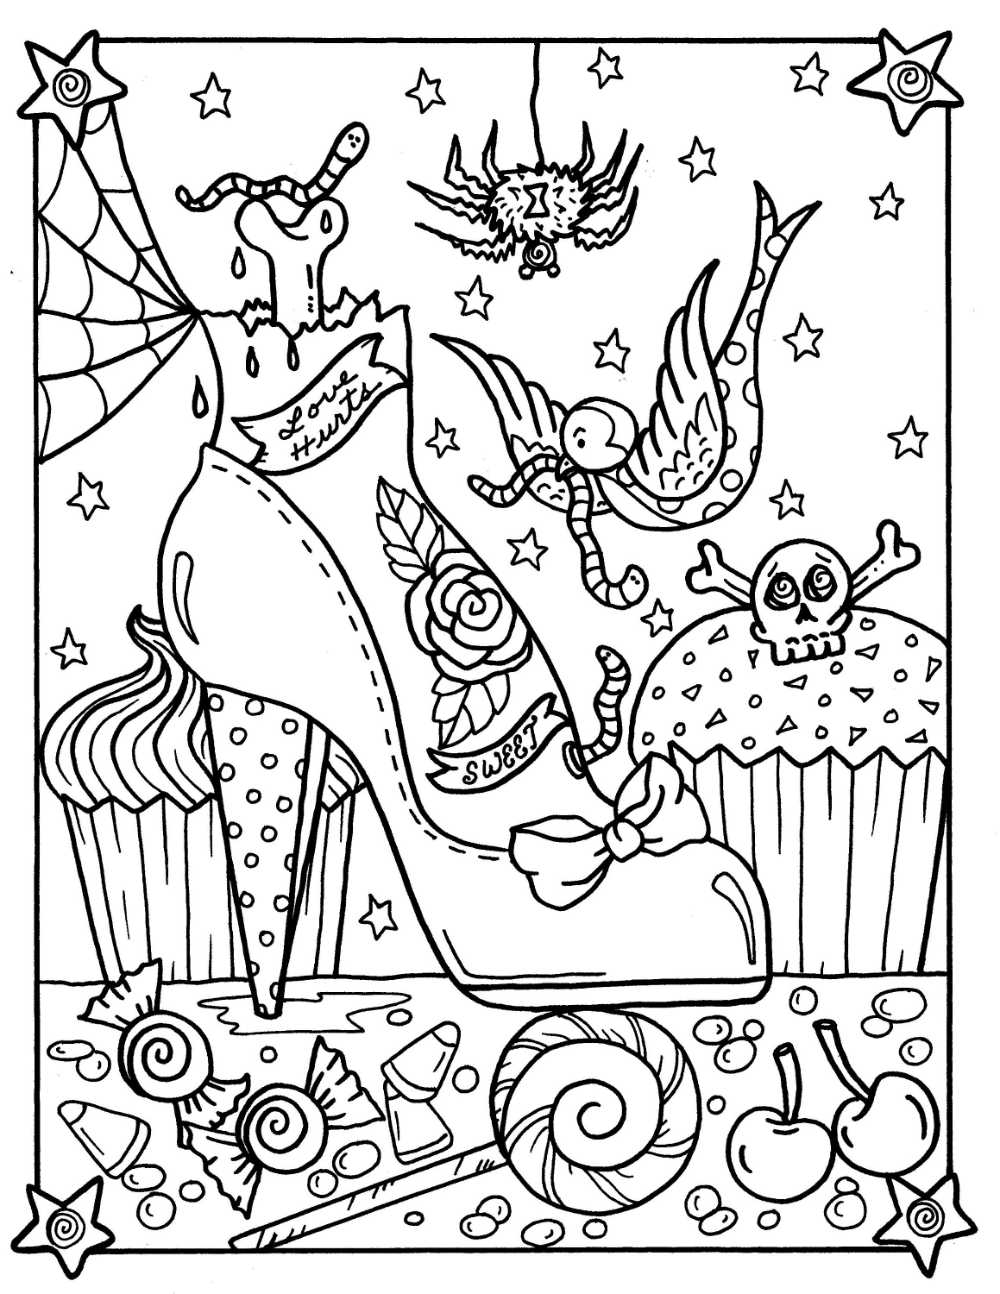 Pin On Coloring Pages Deborah Muller